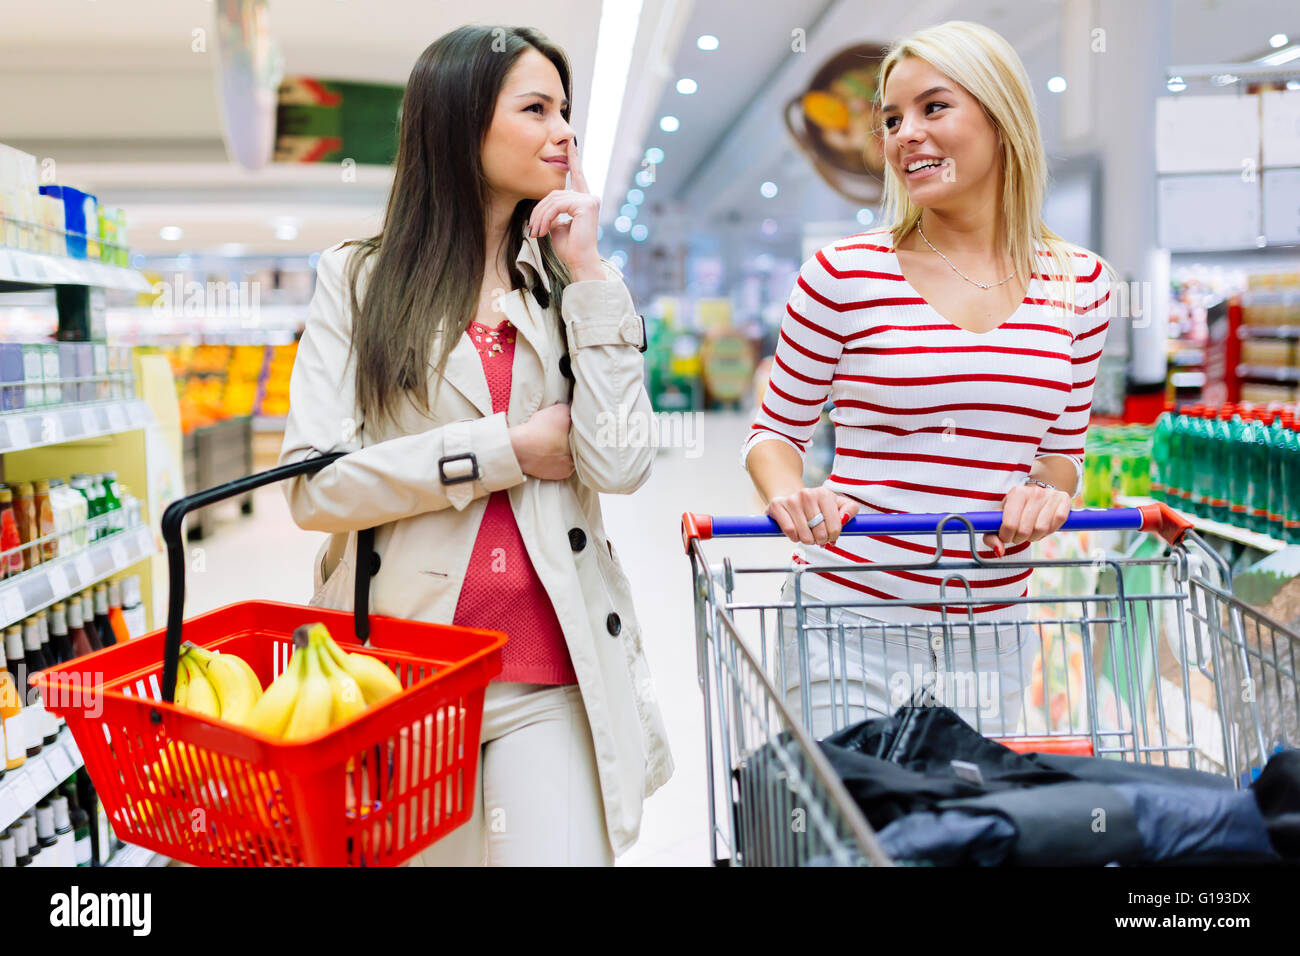 Two beautiful women shopping in supermarket - Stock Image